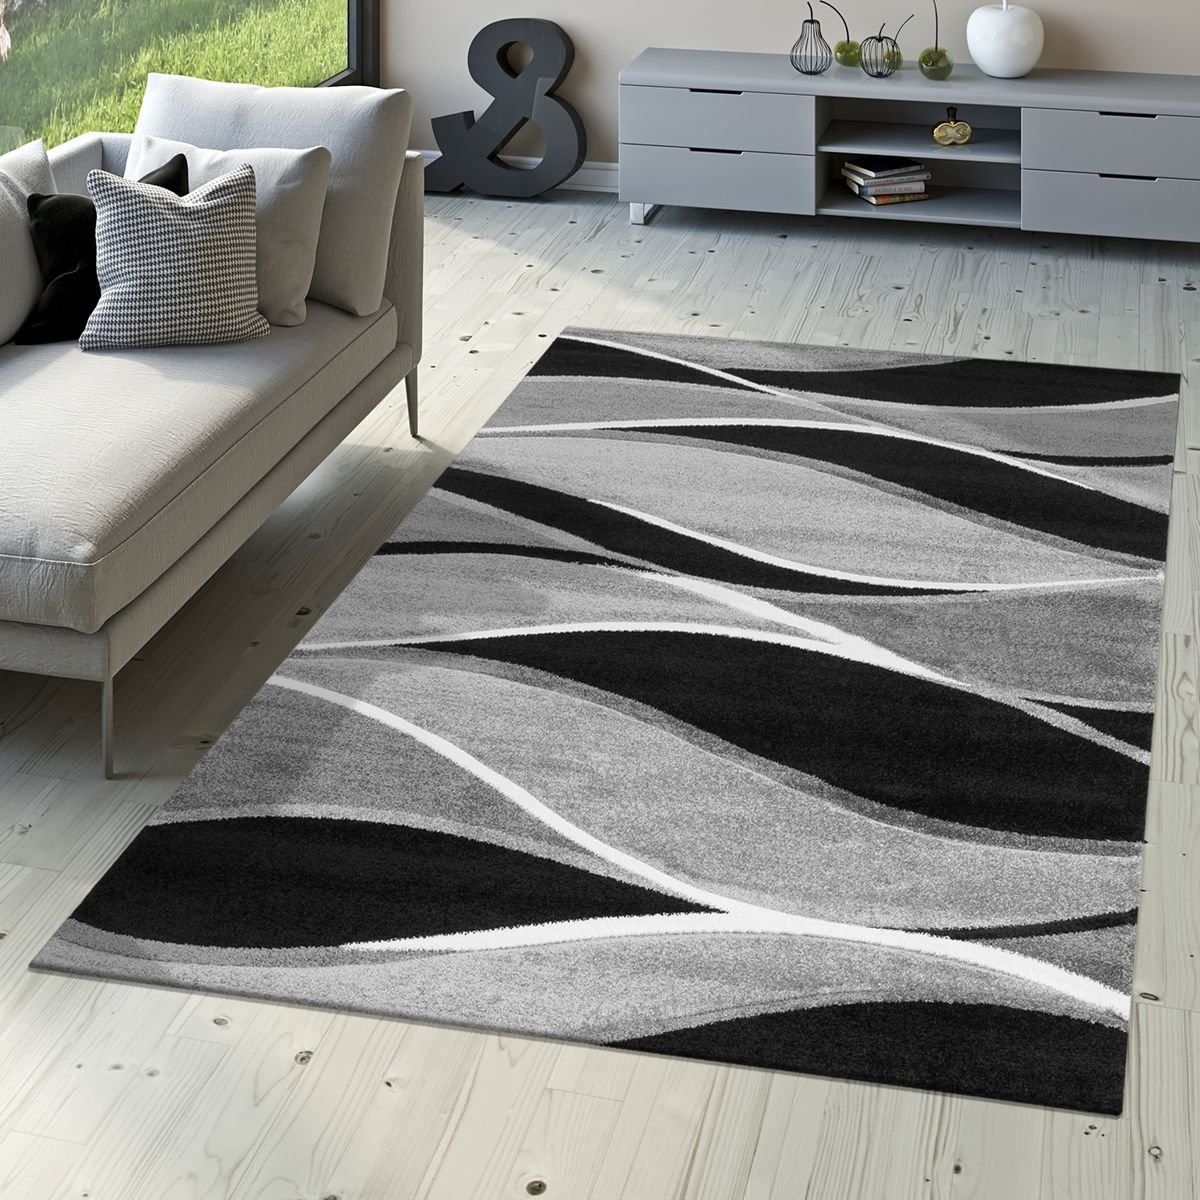 Alfombra de diseño moderna de pelo corto gris negra y turquesa a rayas onduladas